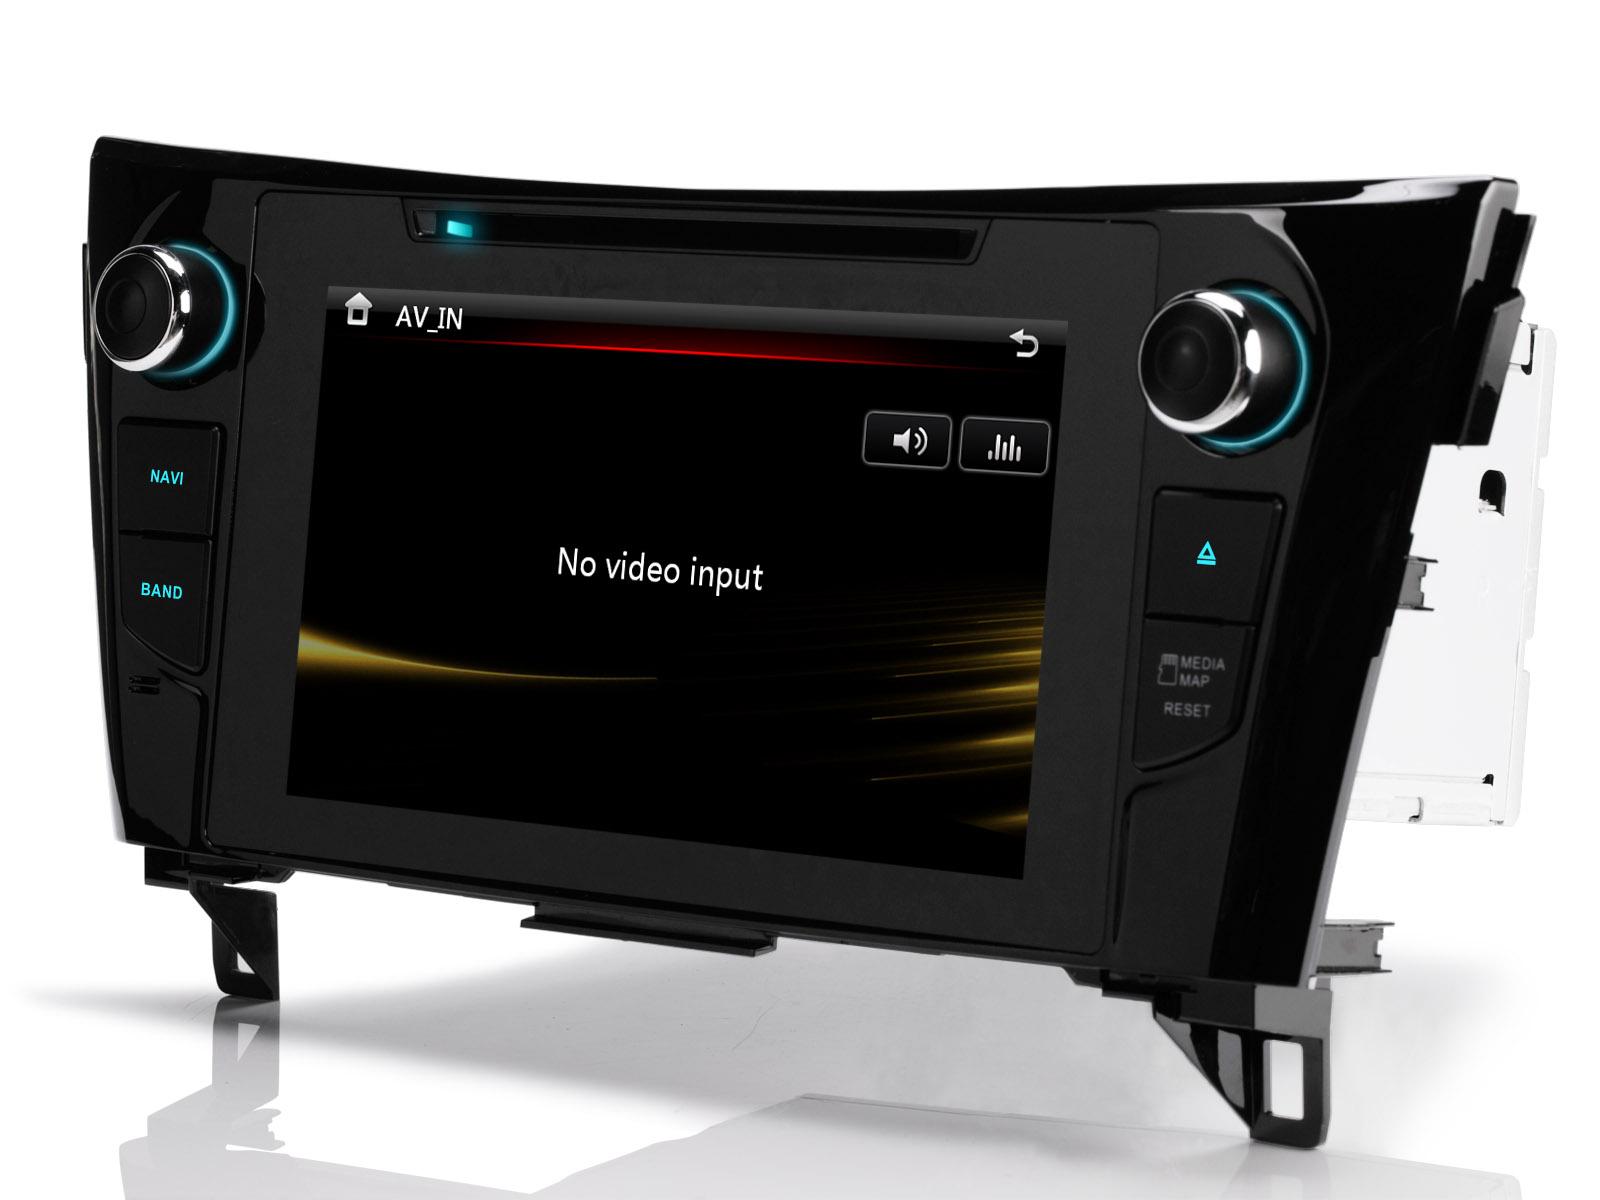 r ckfahrkamera 8 autoradio navi gps dvd bt f r nissan. Black Bedroom Furniture Sets. Home Design Ideas